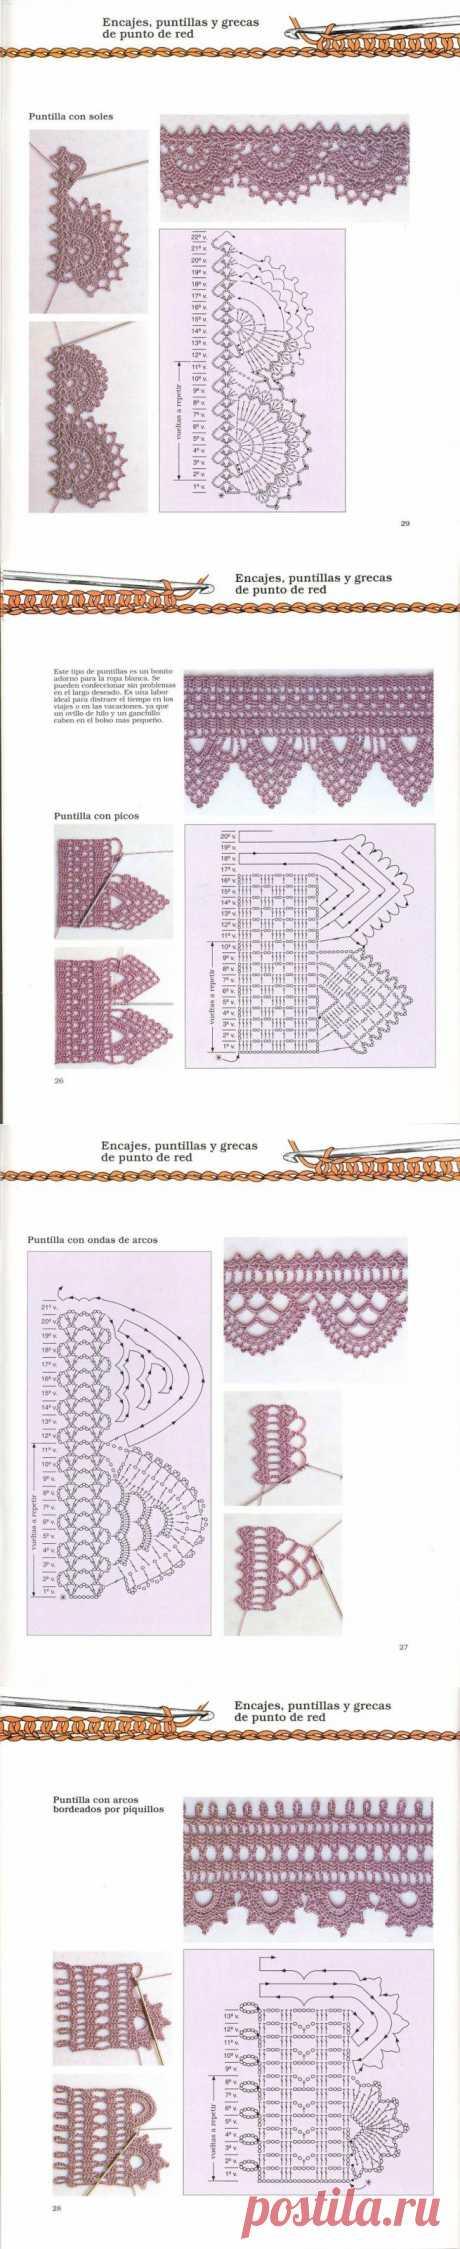 vyazan.kayma, schemes of knitting by a hook - mad1959 — я.ру